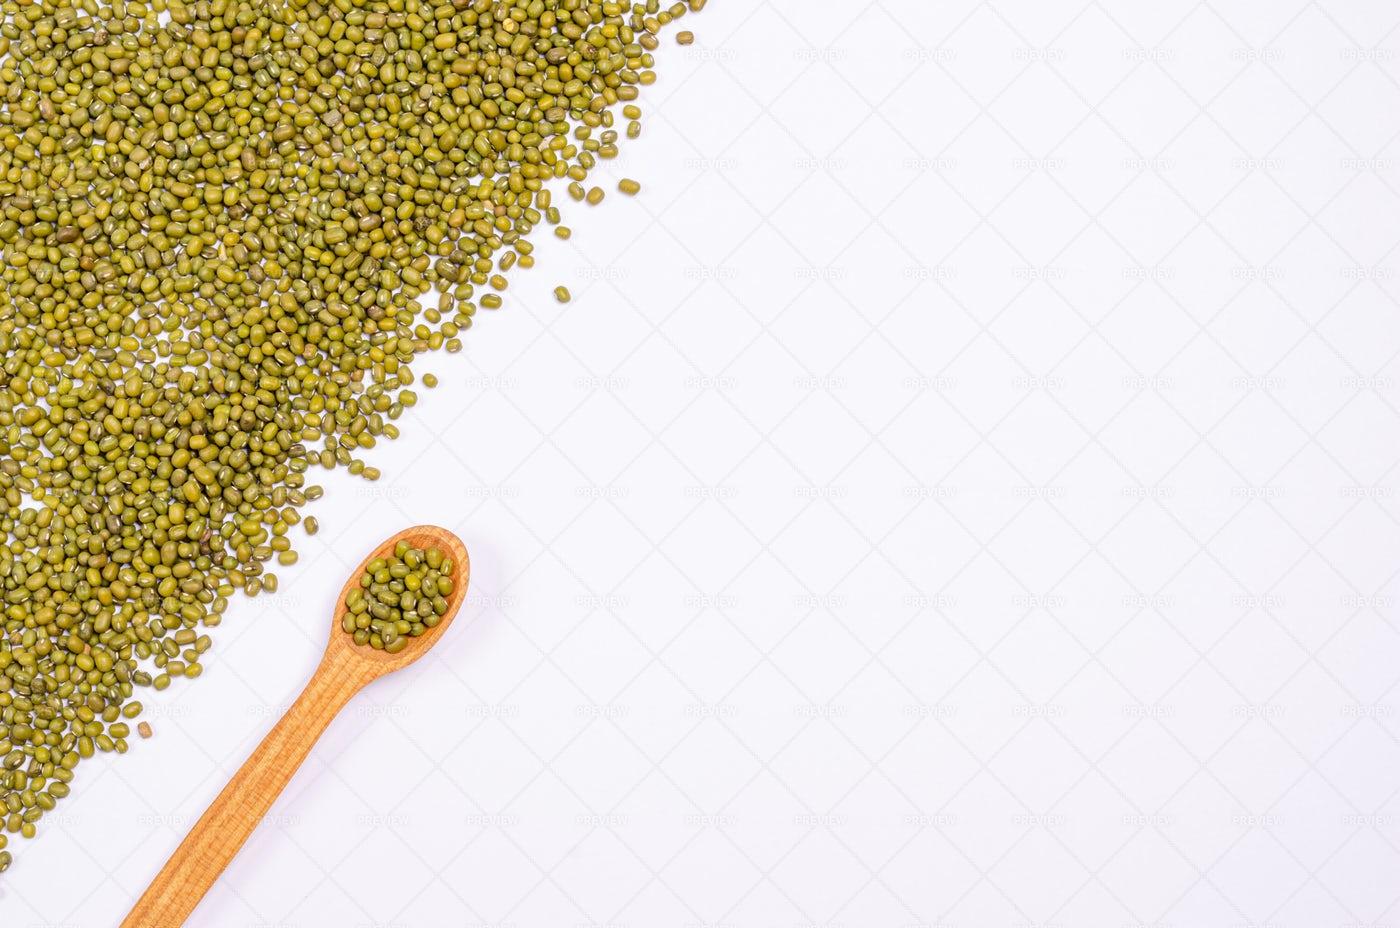 Raw Lentils: Stock Photos